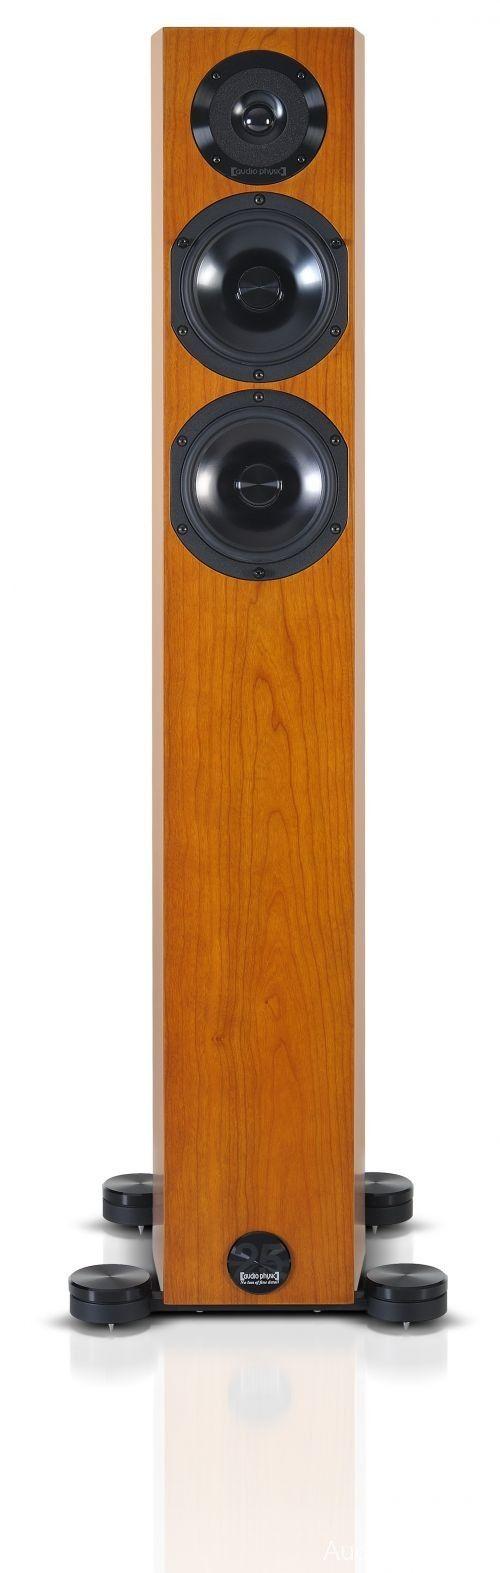 http://www.audiophile.org/satilik/hoparlor/kule-tipi/ilan/27489/audio-physic-sitara-25-handmade-in-germany/